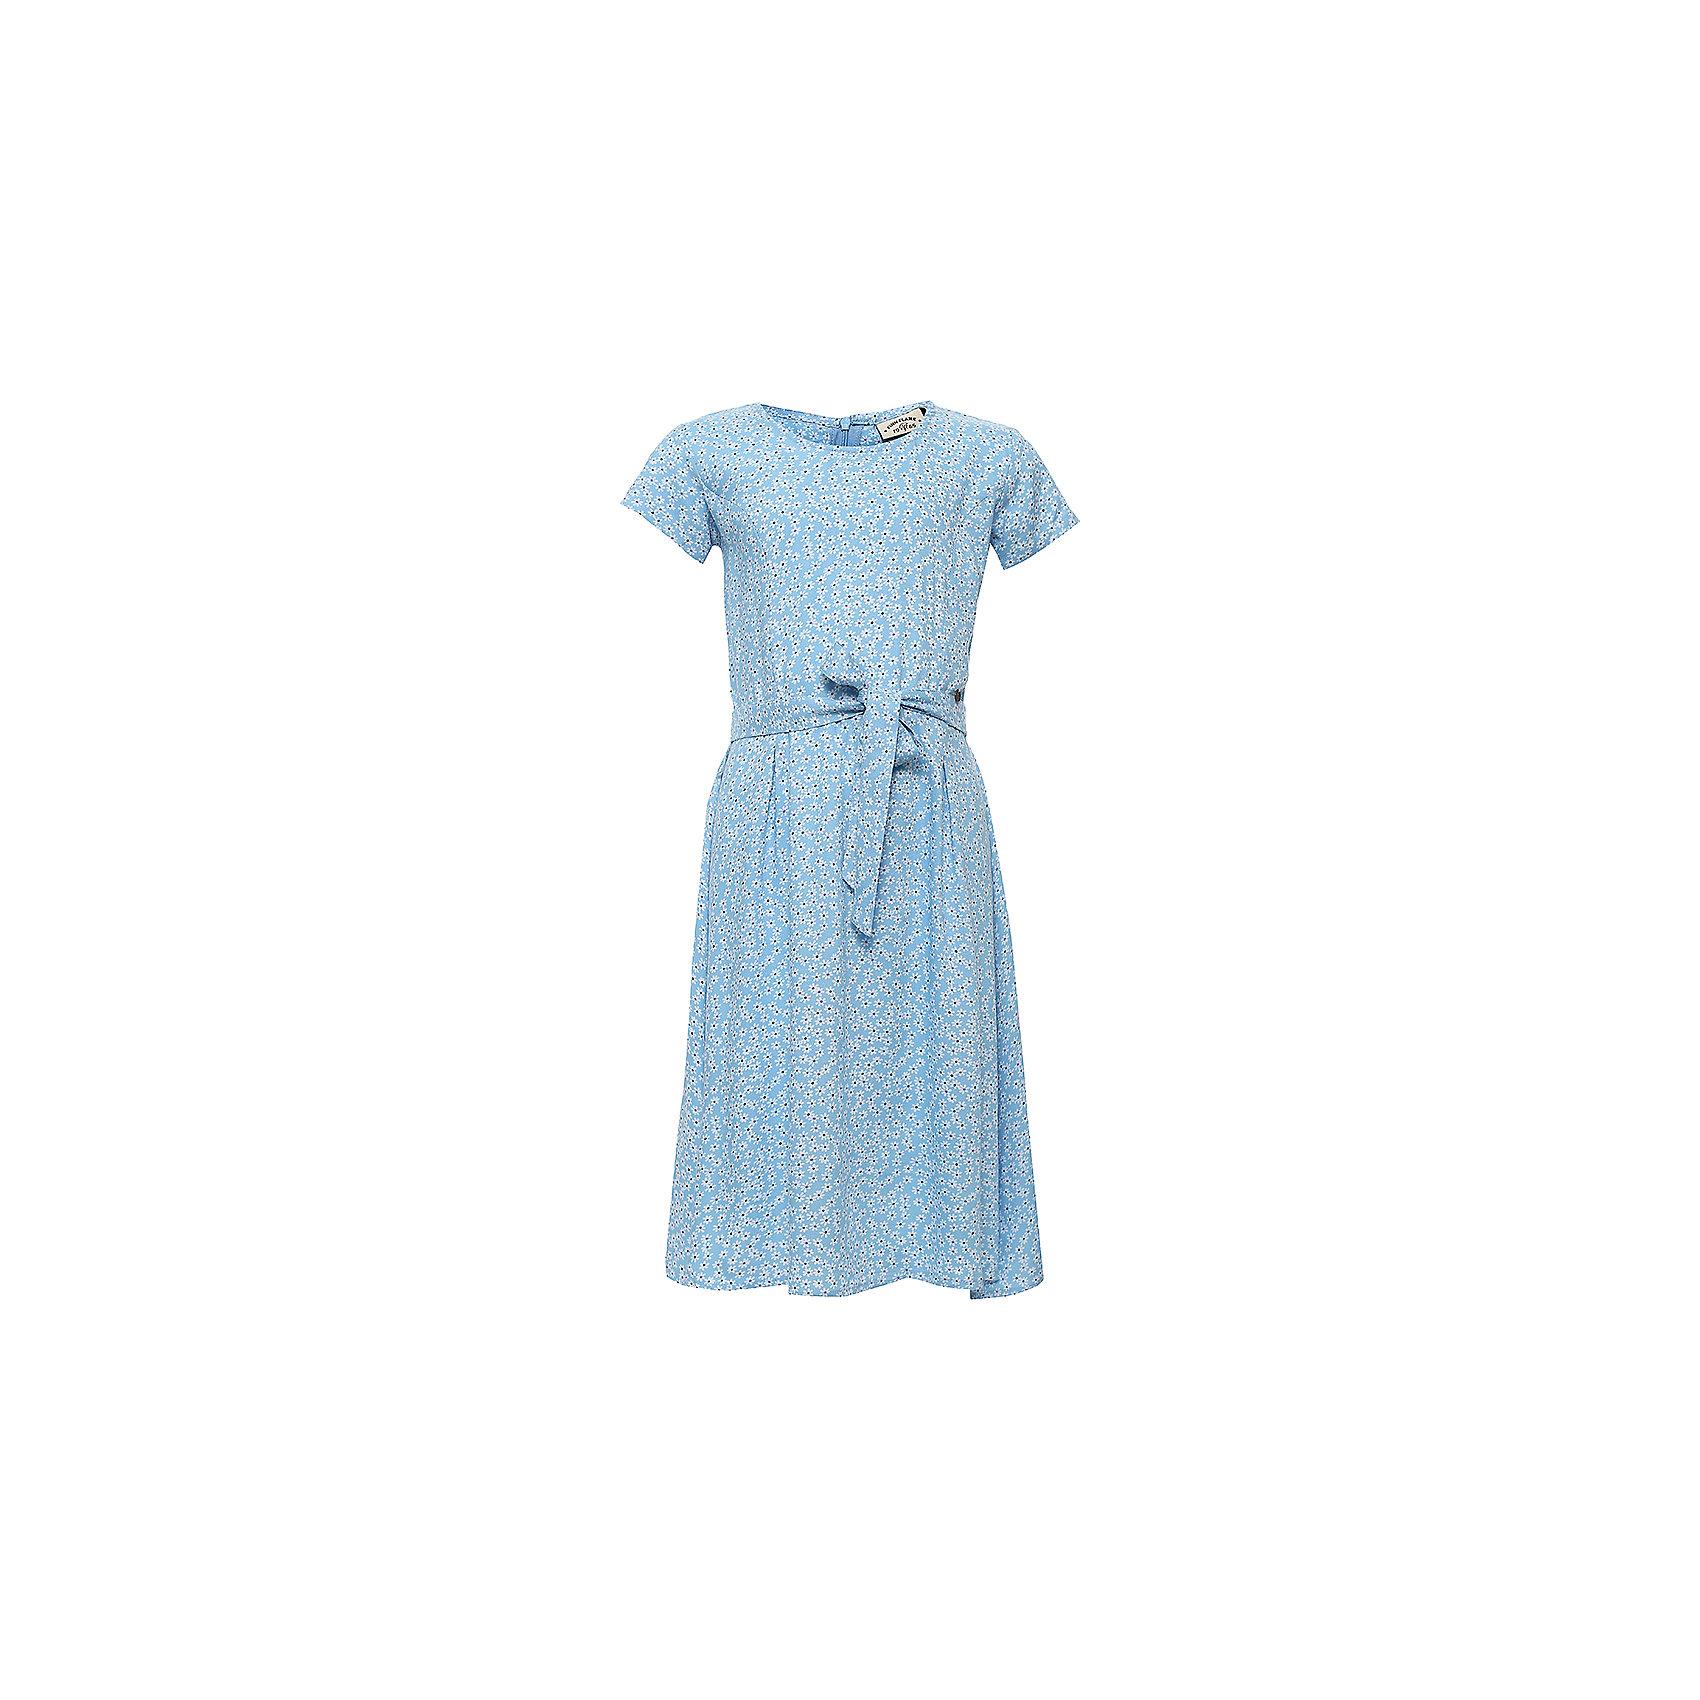 Платье для девочки Finn FlareПлатье для девочки от известного бренда Finn Flare<br>Фактура материала:Текстильный<br>Вид застежки:Молния<br> Длина рукава:Короткие<br> Тип карманов:Без карманов<br>Состав:<br>100% вискоза<br><br>Ширина мм: 236<br>Глубина мм: 16<br>Высота мм: 184<br>Вес г: 177<br>Цвет: голубой<br>Возраст от месяцев: 48<br>Возраст до месяцев: 60<br>Пол: Женский<br>Возраст: Детский<br>Размер: 110,122<br>SKU: 4835232